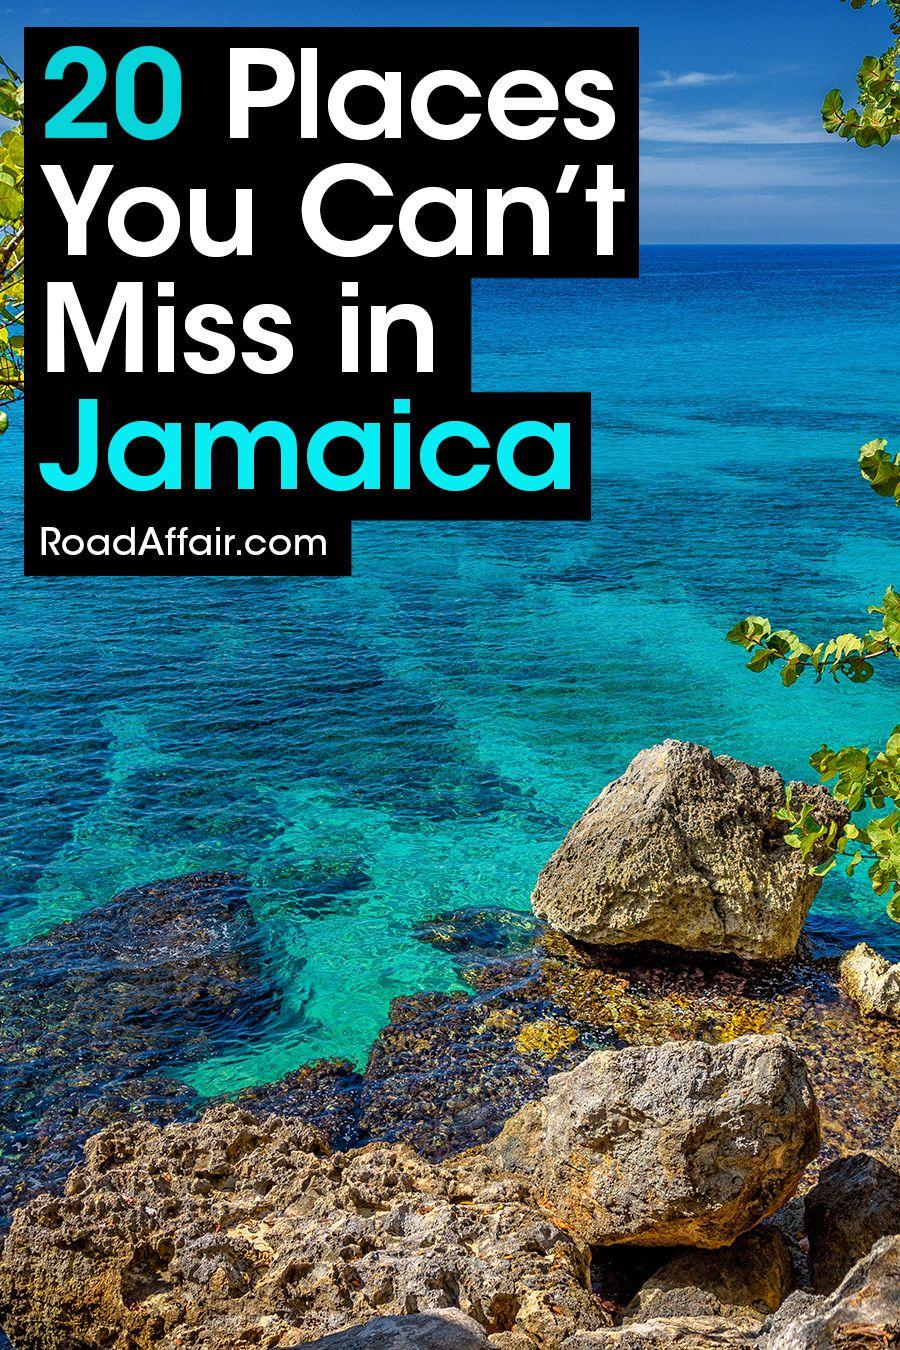 jamaica places visit vacation negril spots travel roadaffair cool road